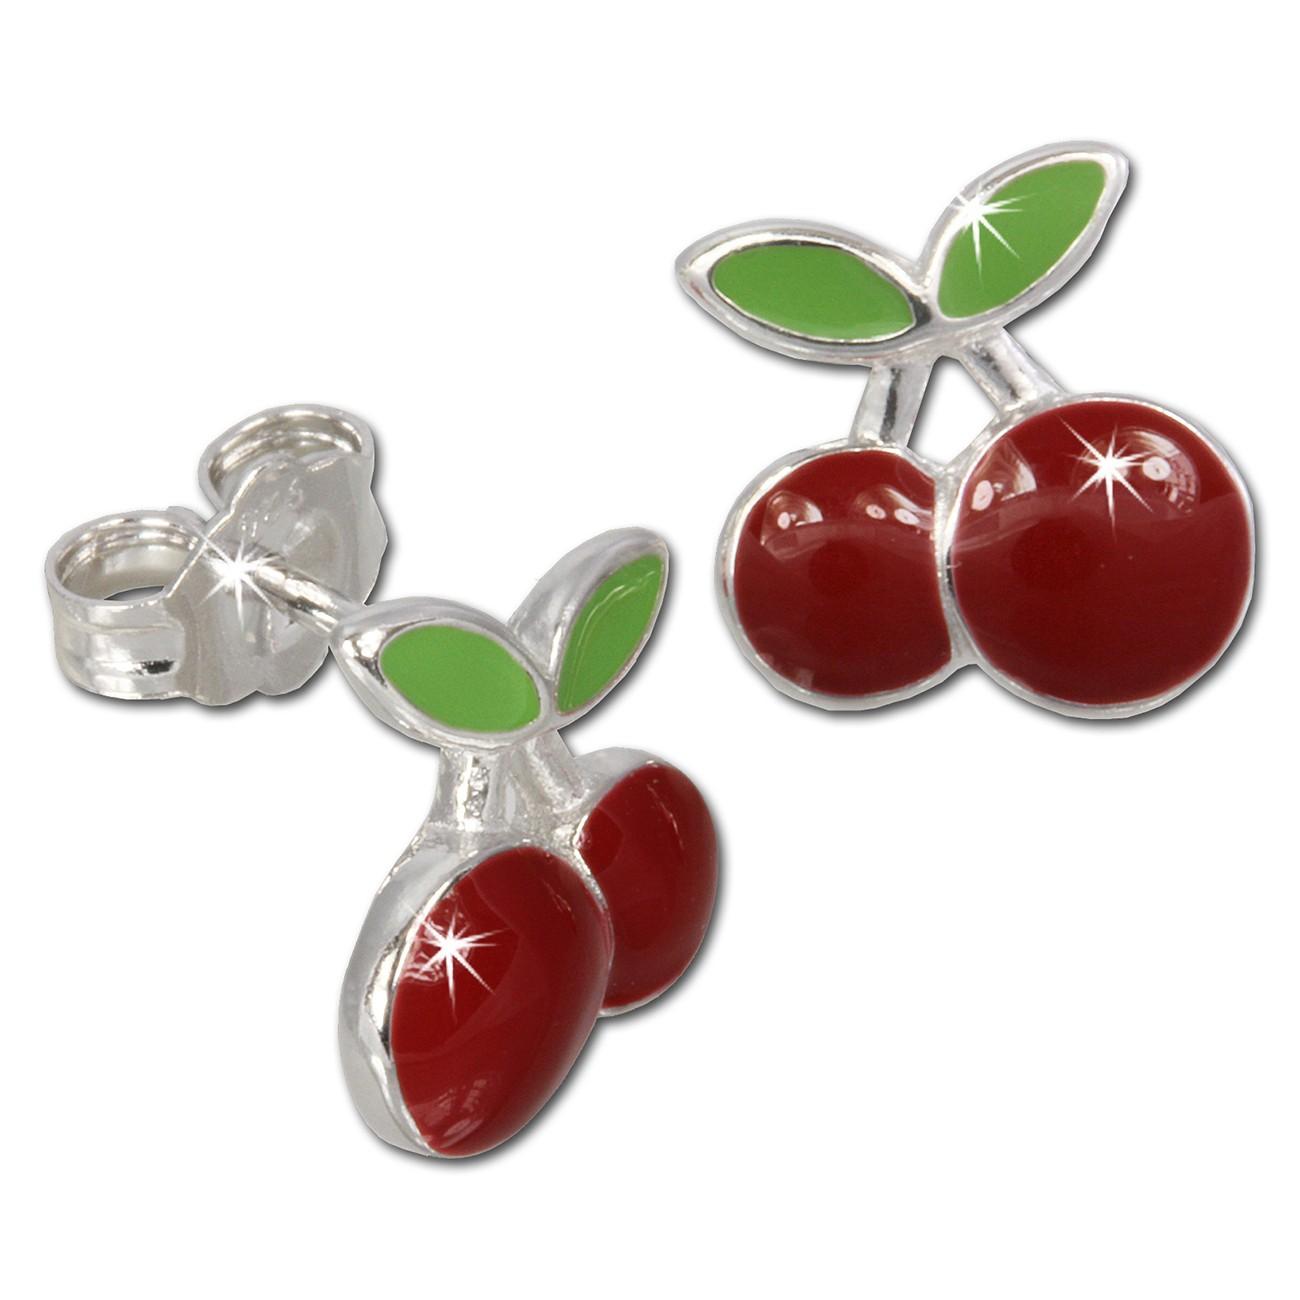 Kinder Ohrring Kirschen rot Silber Ohrstecker Kinderschmuck TW SDO609R